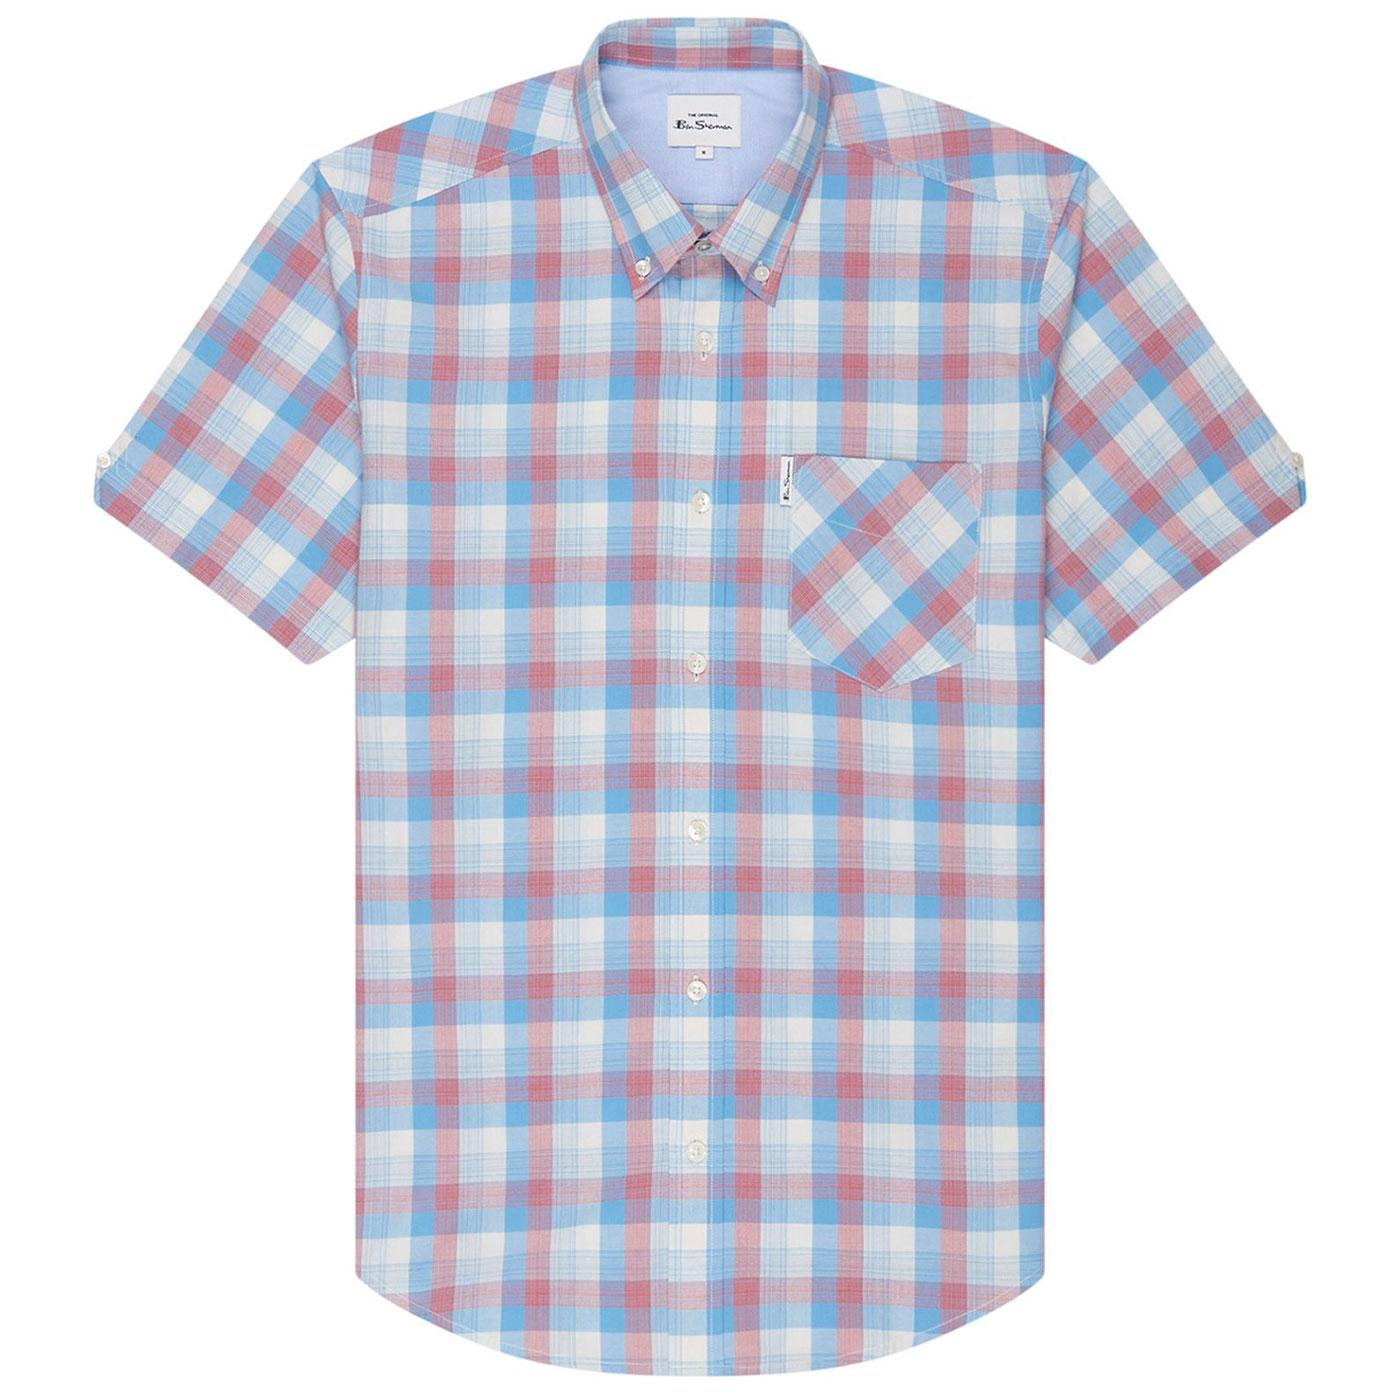 BEN SHERMAN Retro Mod 70s Gradient Check Shirt RB